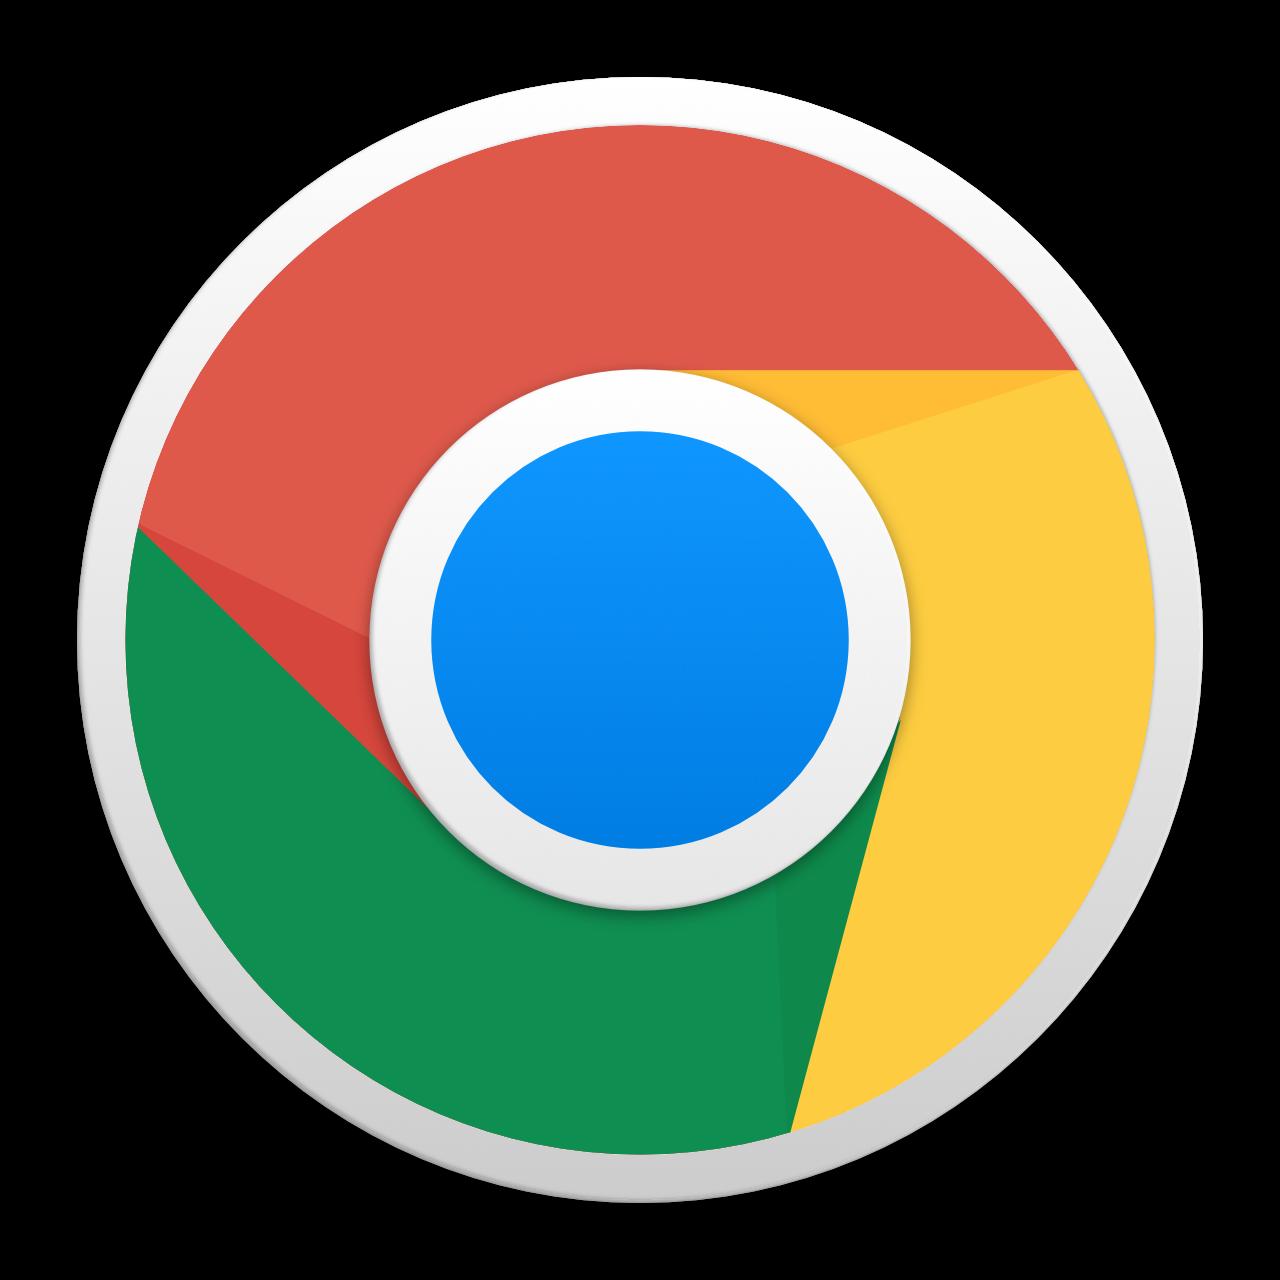 Google chrome themes yosemite - Google Chrome App Icon Yosemite Style Updated By Macoscrazy